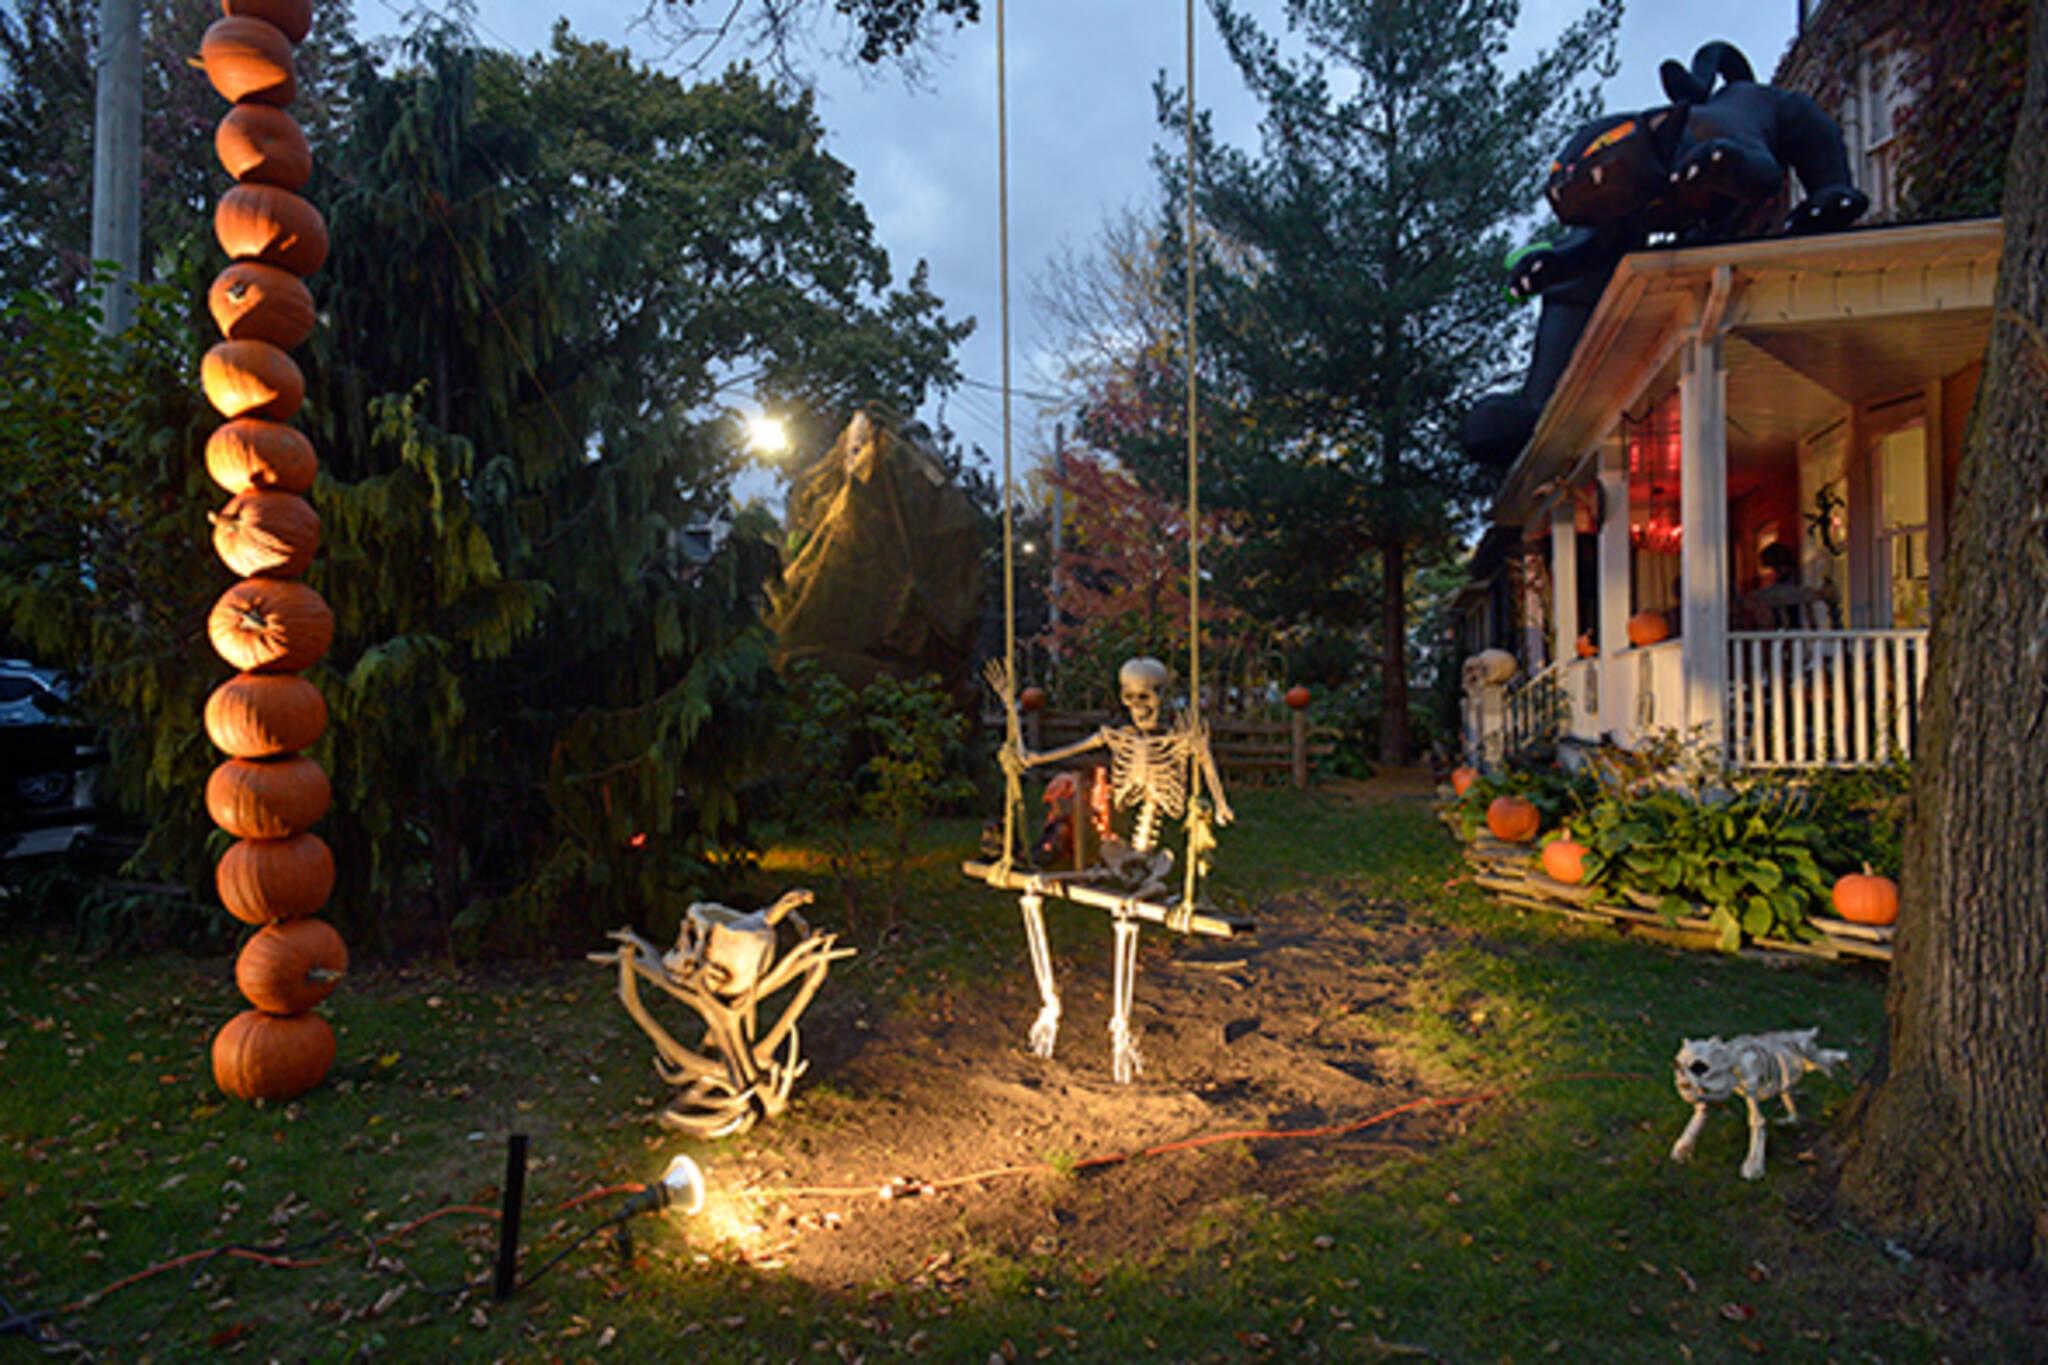 Best Decorated Halloween Houses Toronto